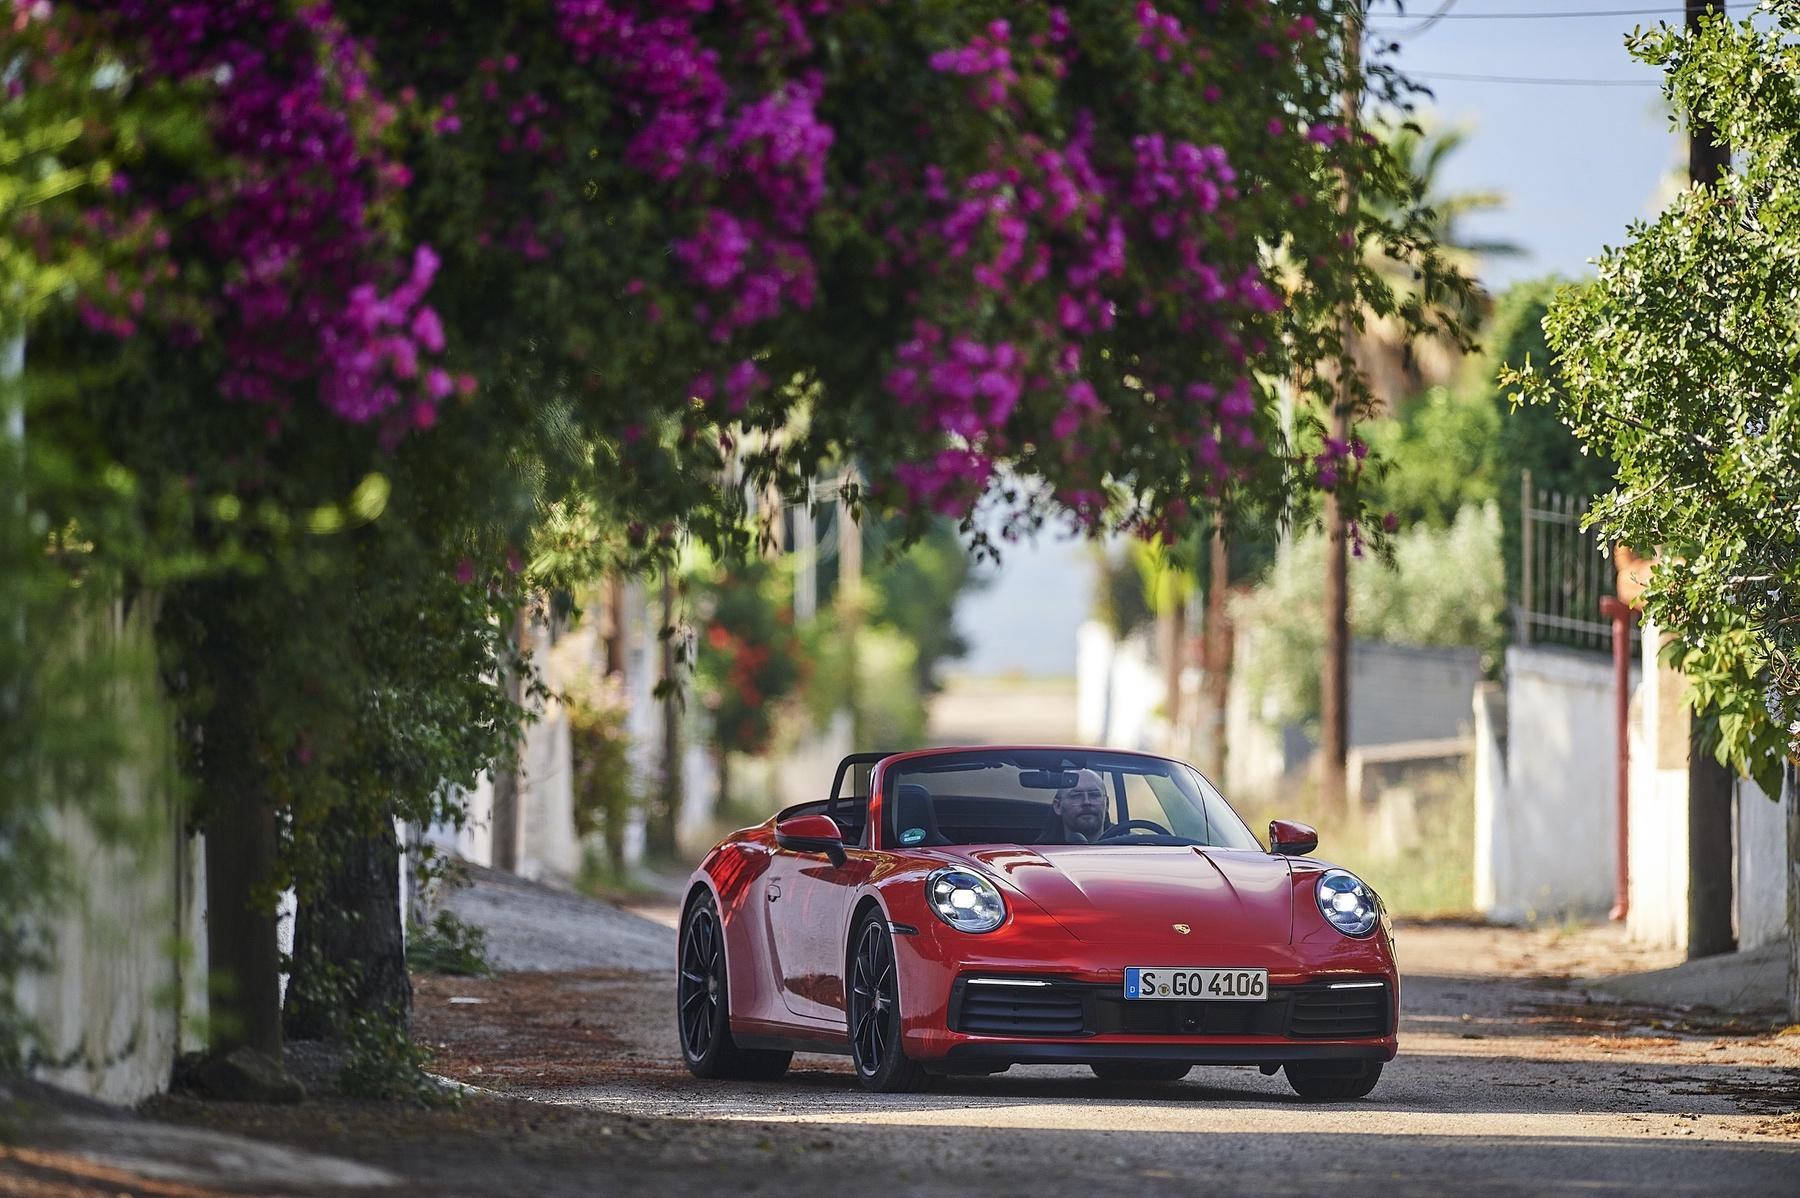 Test_Drive_Porsche_911_Athens_0118